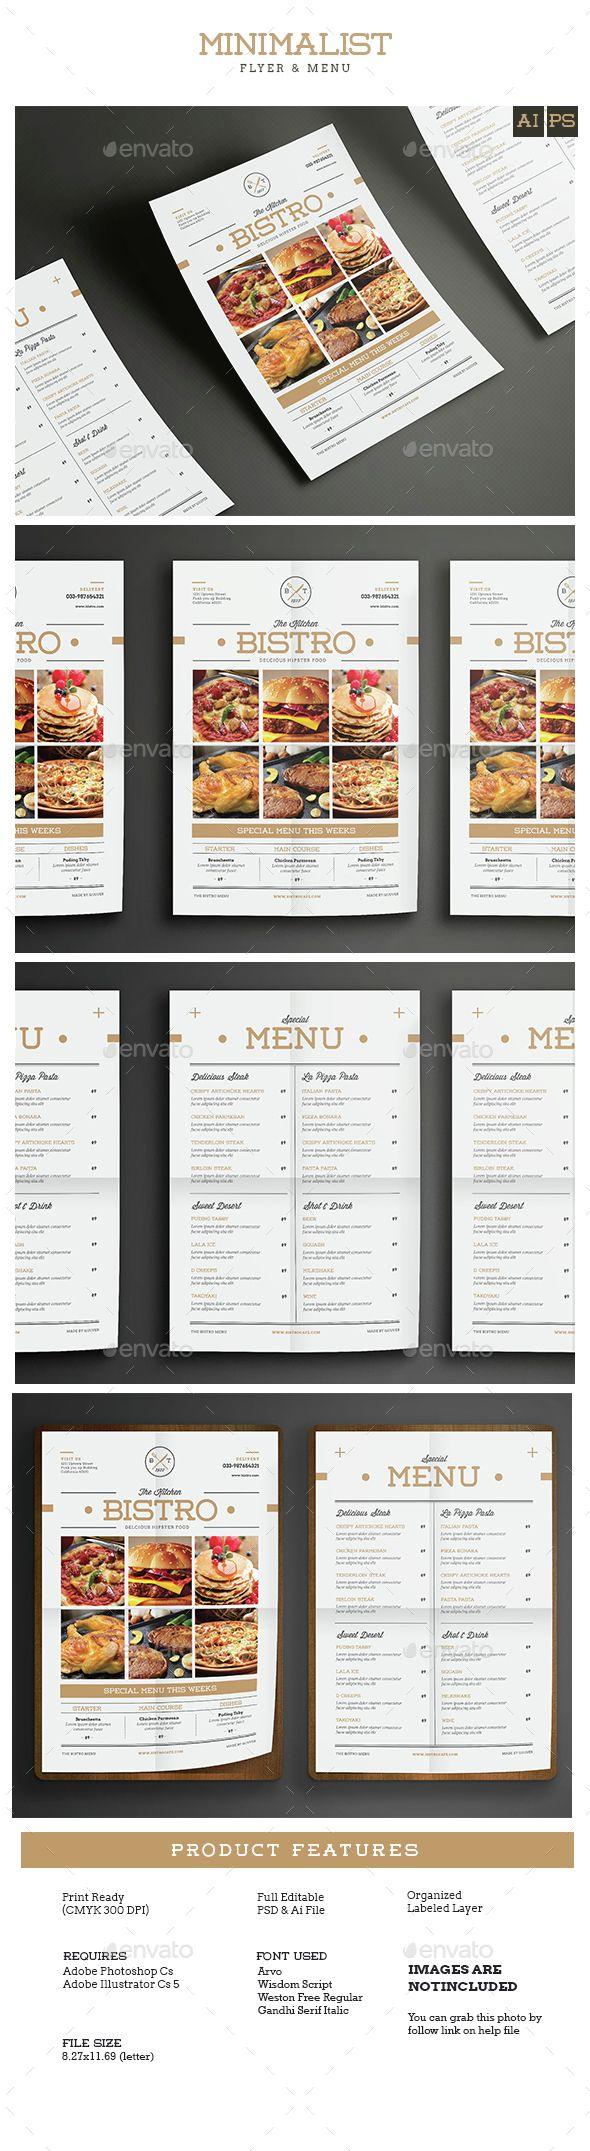 Minimal Restaurant Food Flyer Menu Template PSD Vector AI - Adobe illustrator menu template